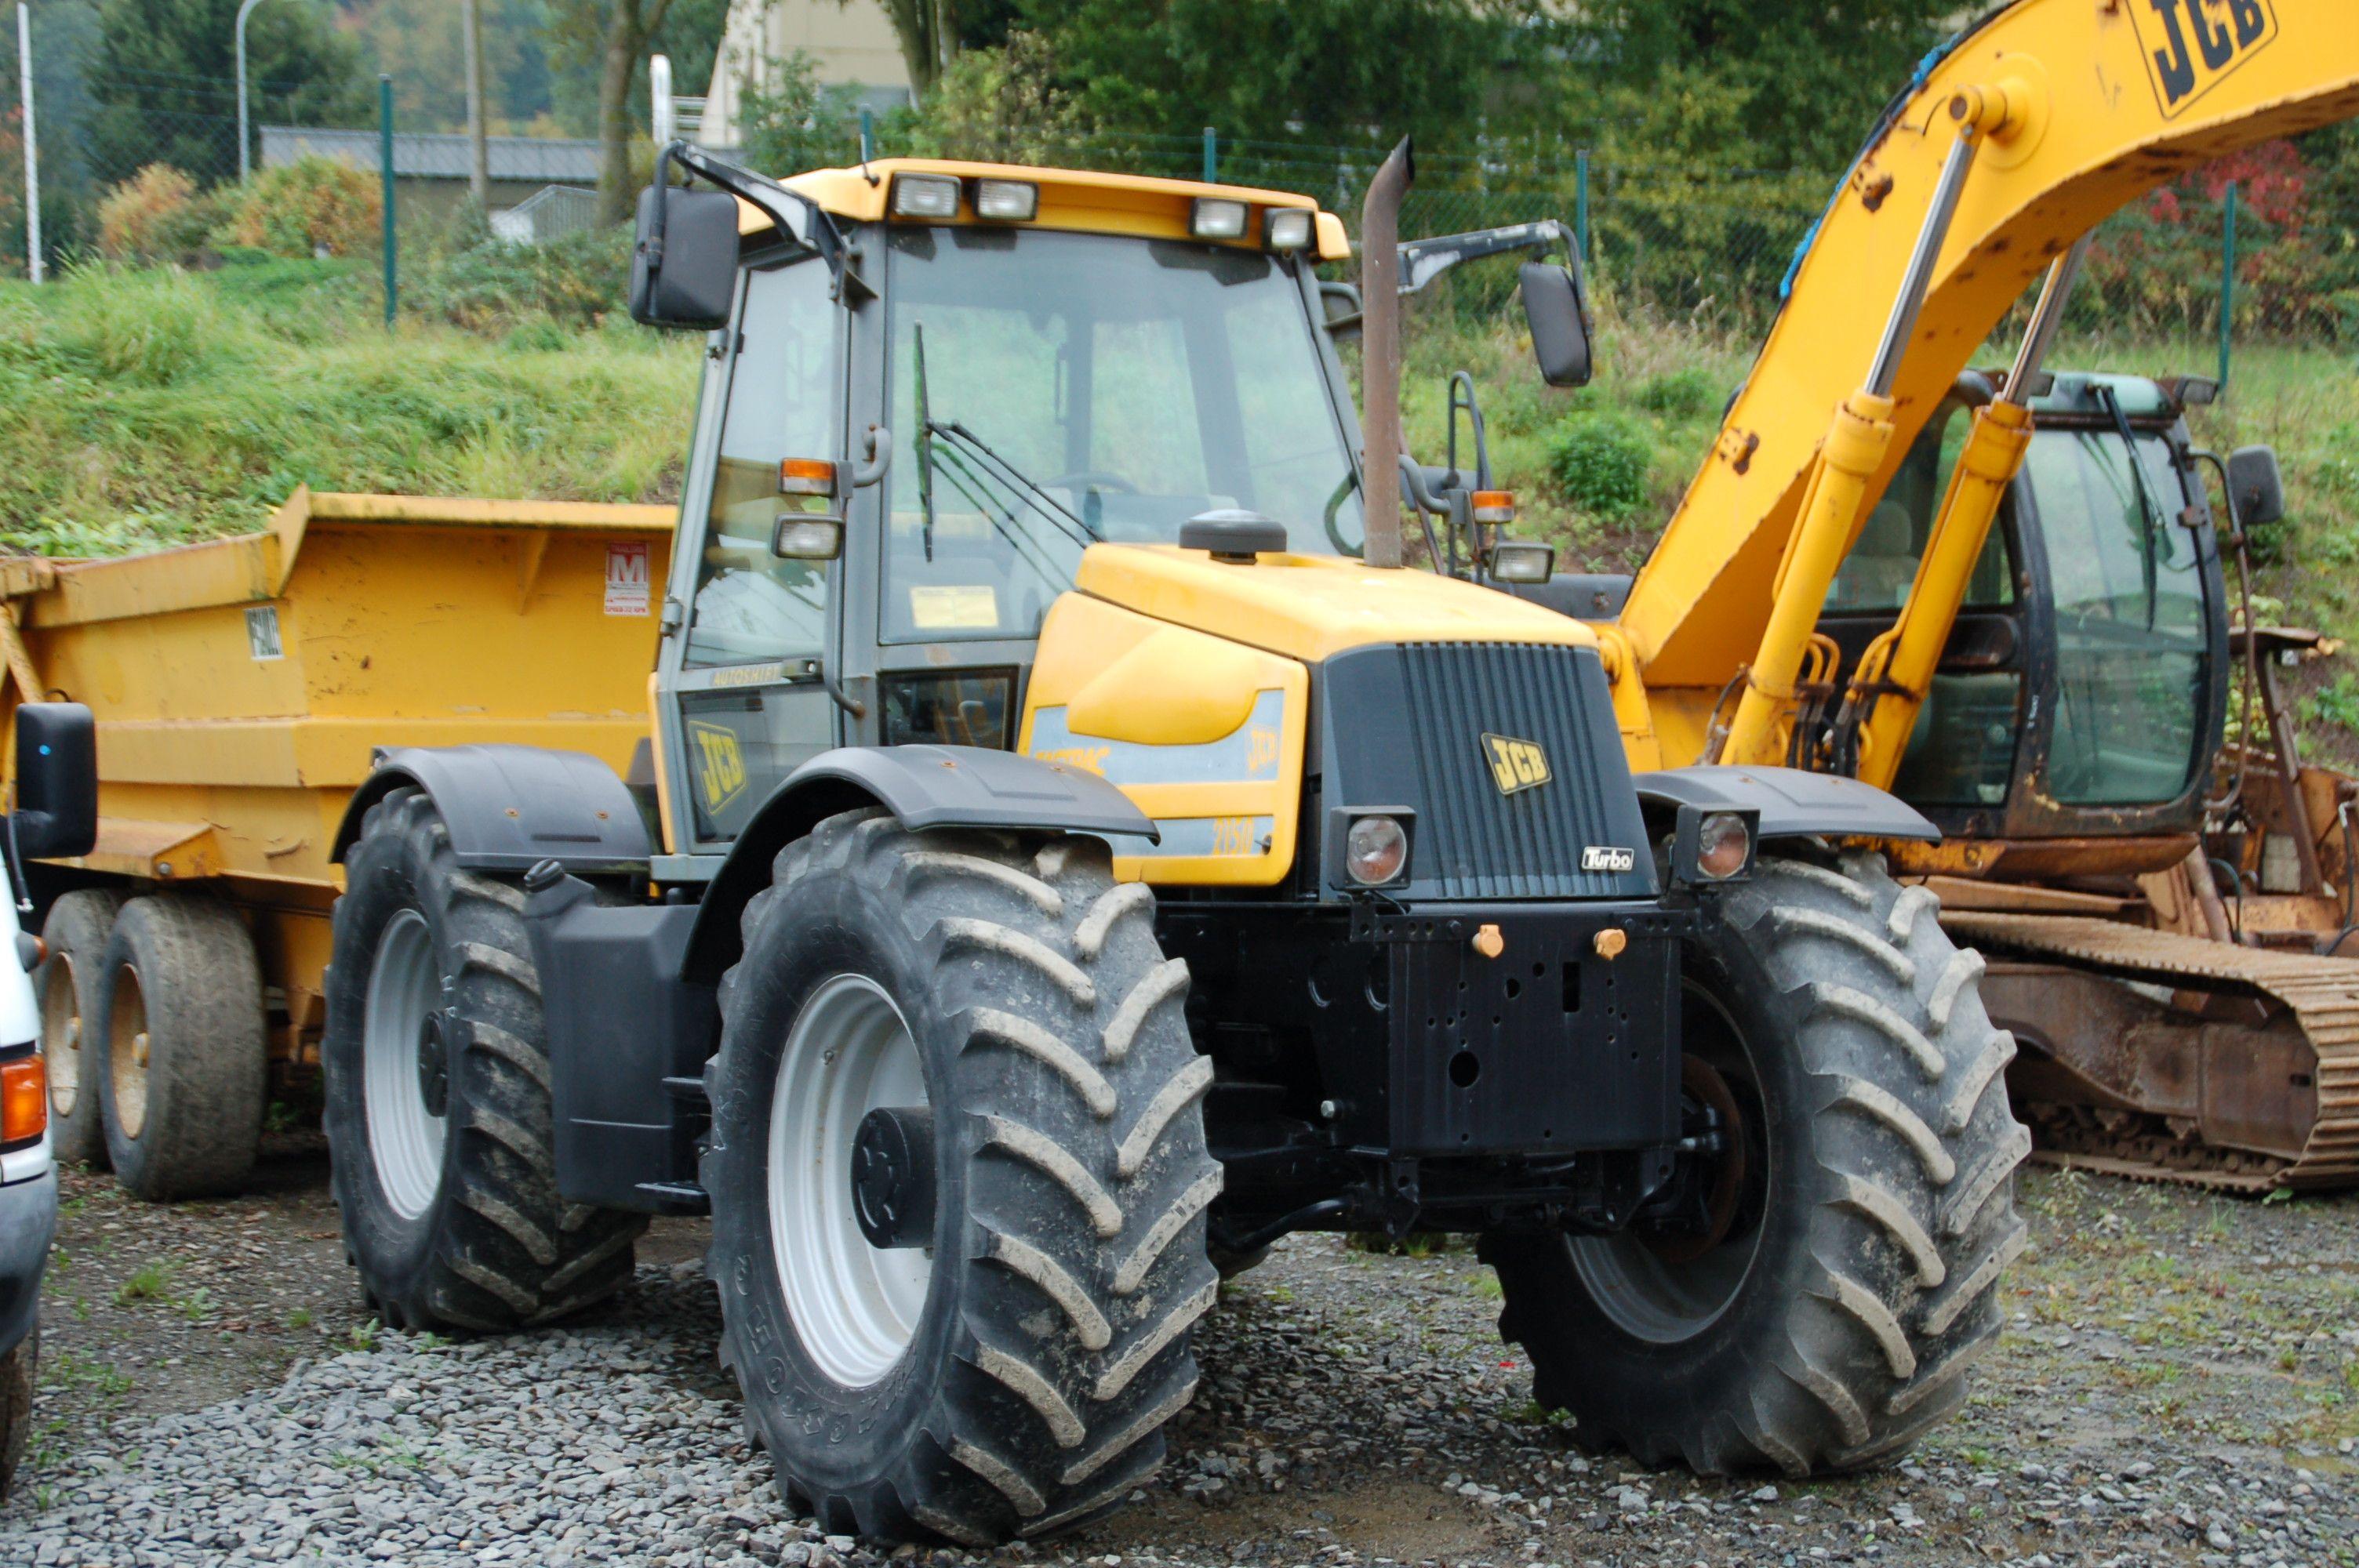 Farm Pictures, Old Tractors, Bagger, Agriculture, Engine, Tractors, Good Job